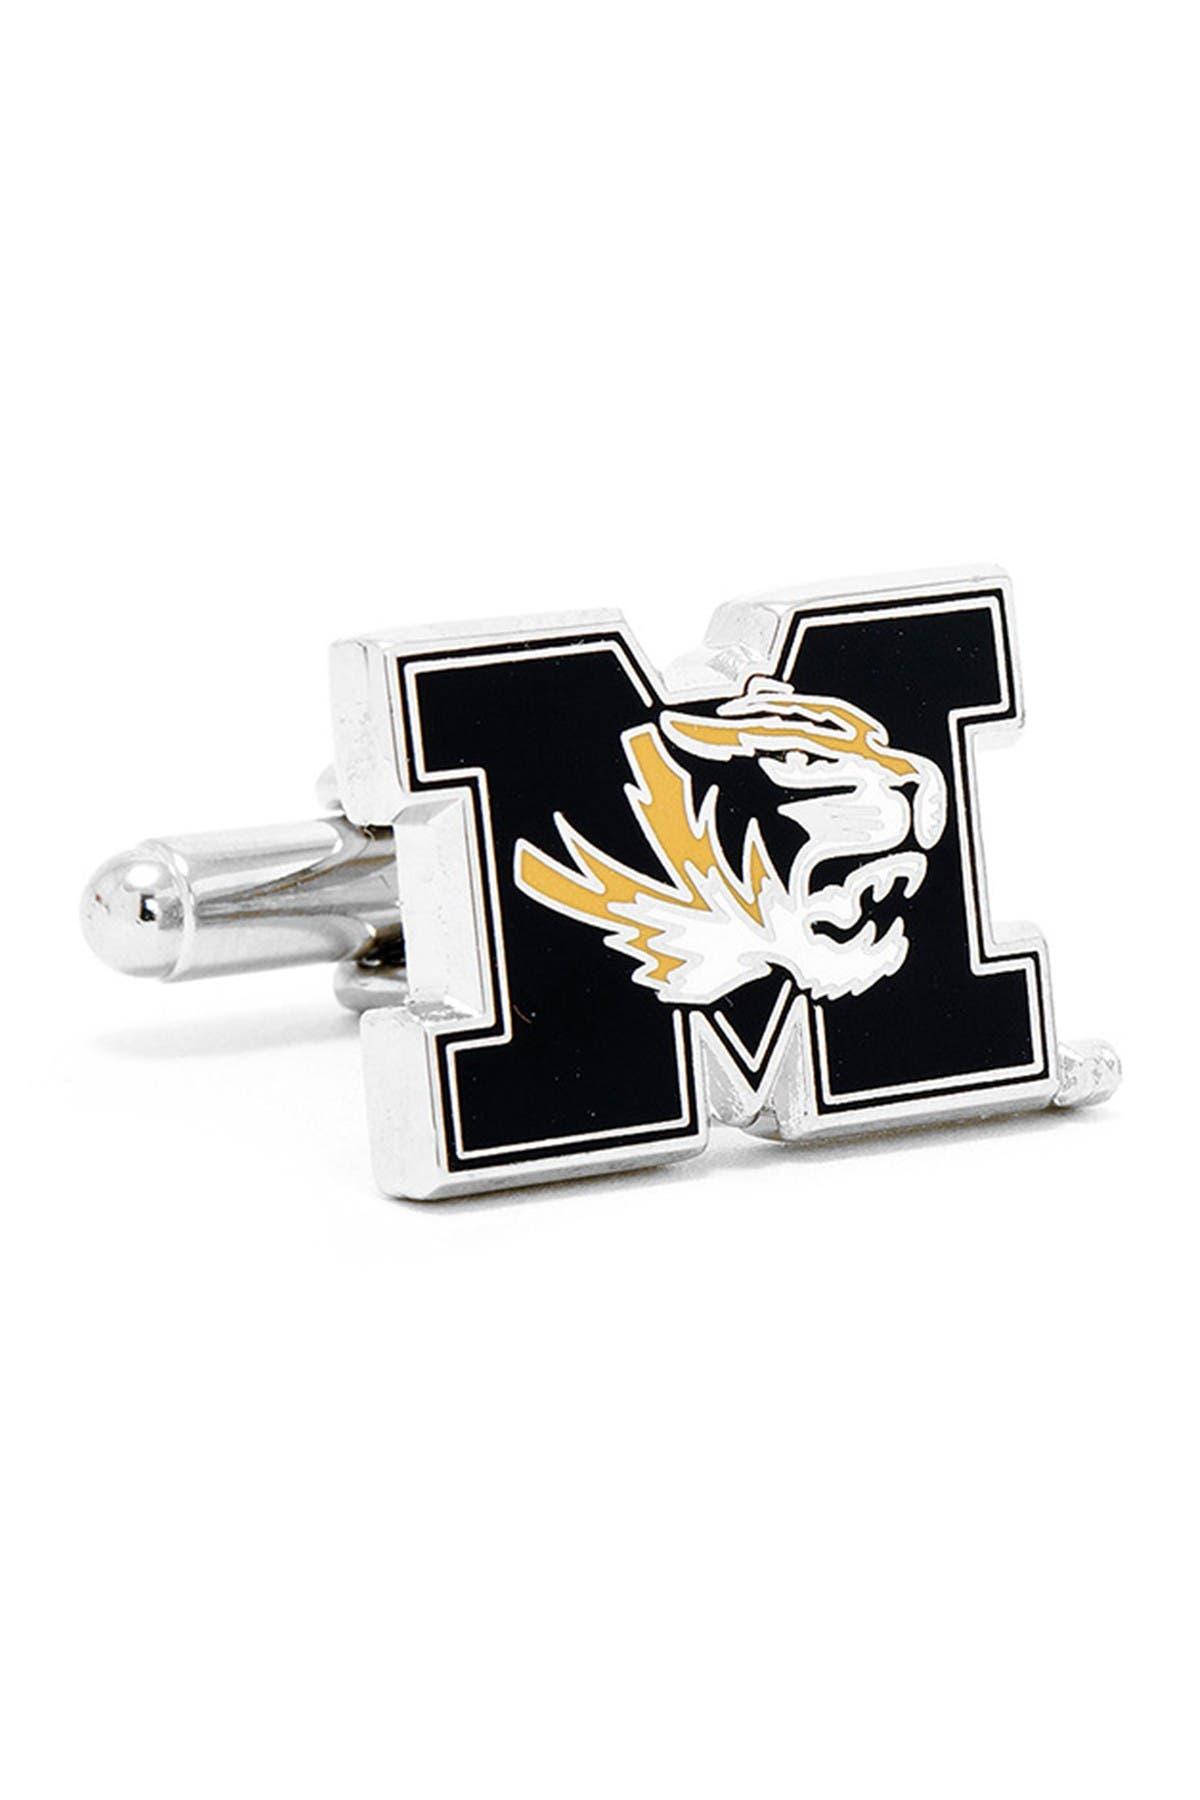 Image of Cufflinks Inc. University of Missouri Tigers Cufflinks